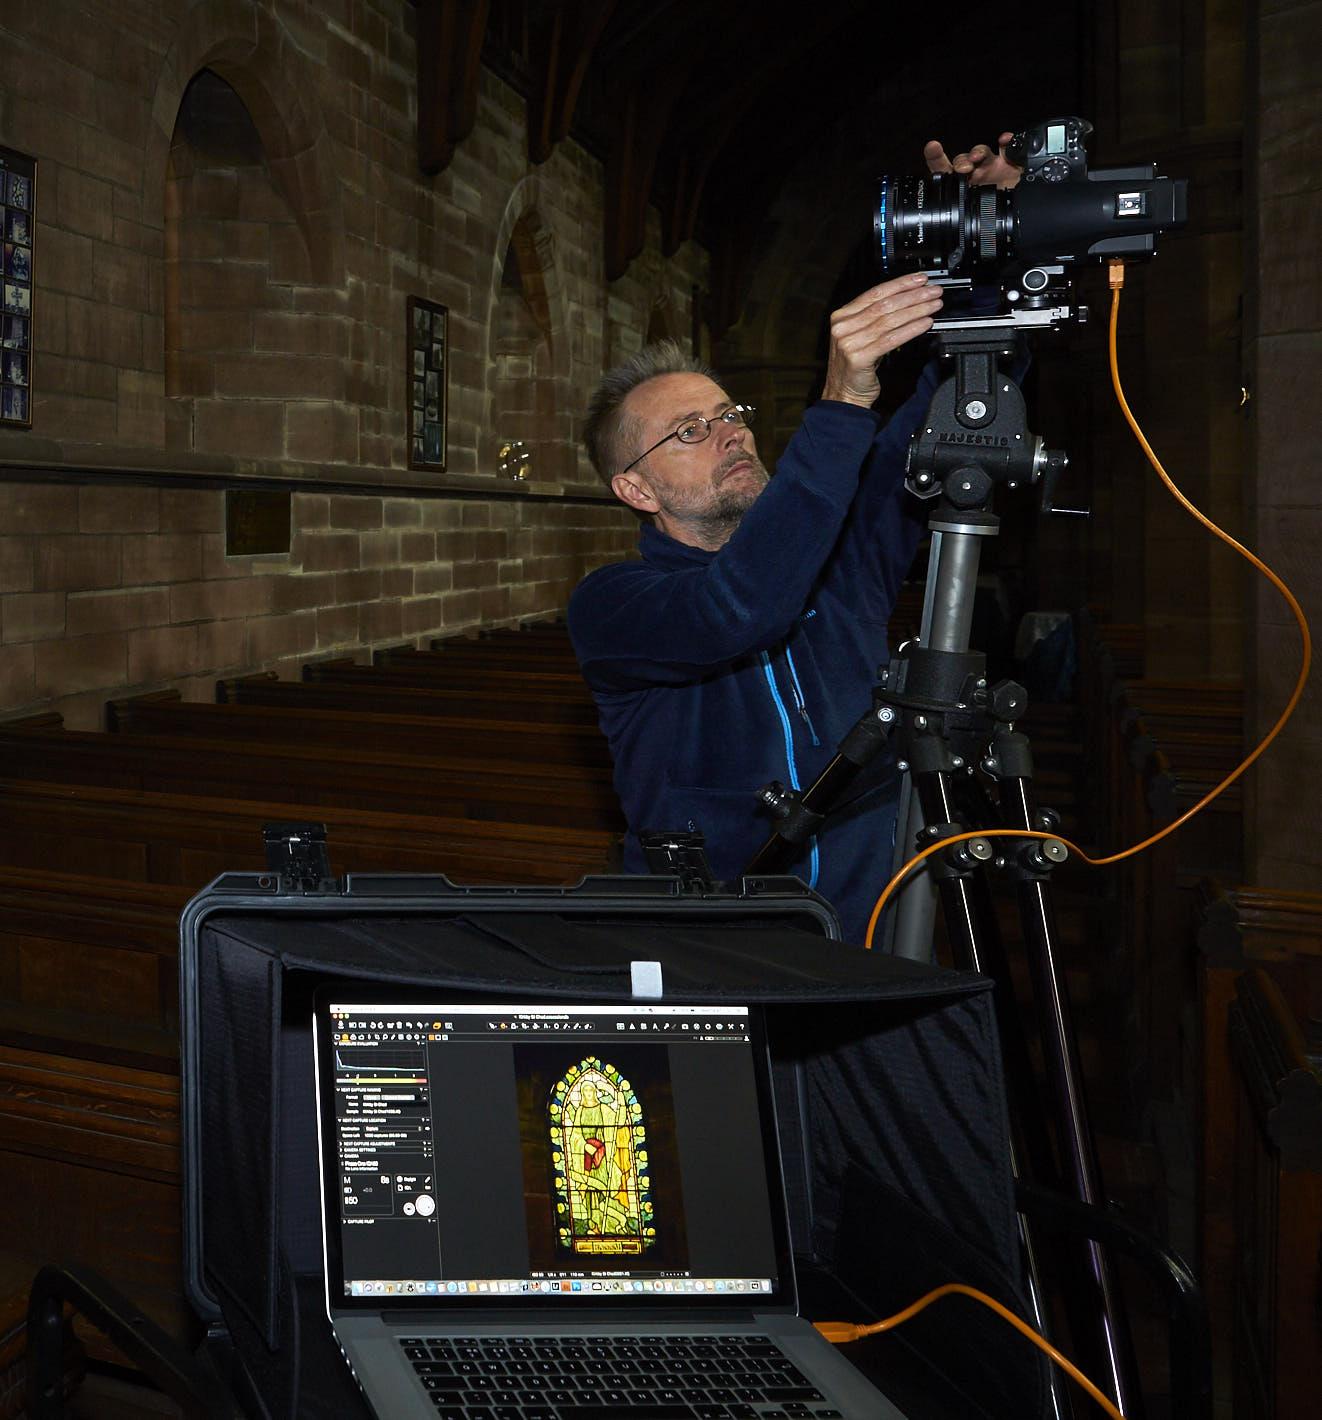 Working with my Schneider Kreuznach tilt/shift lens